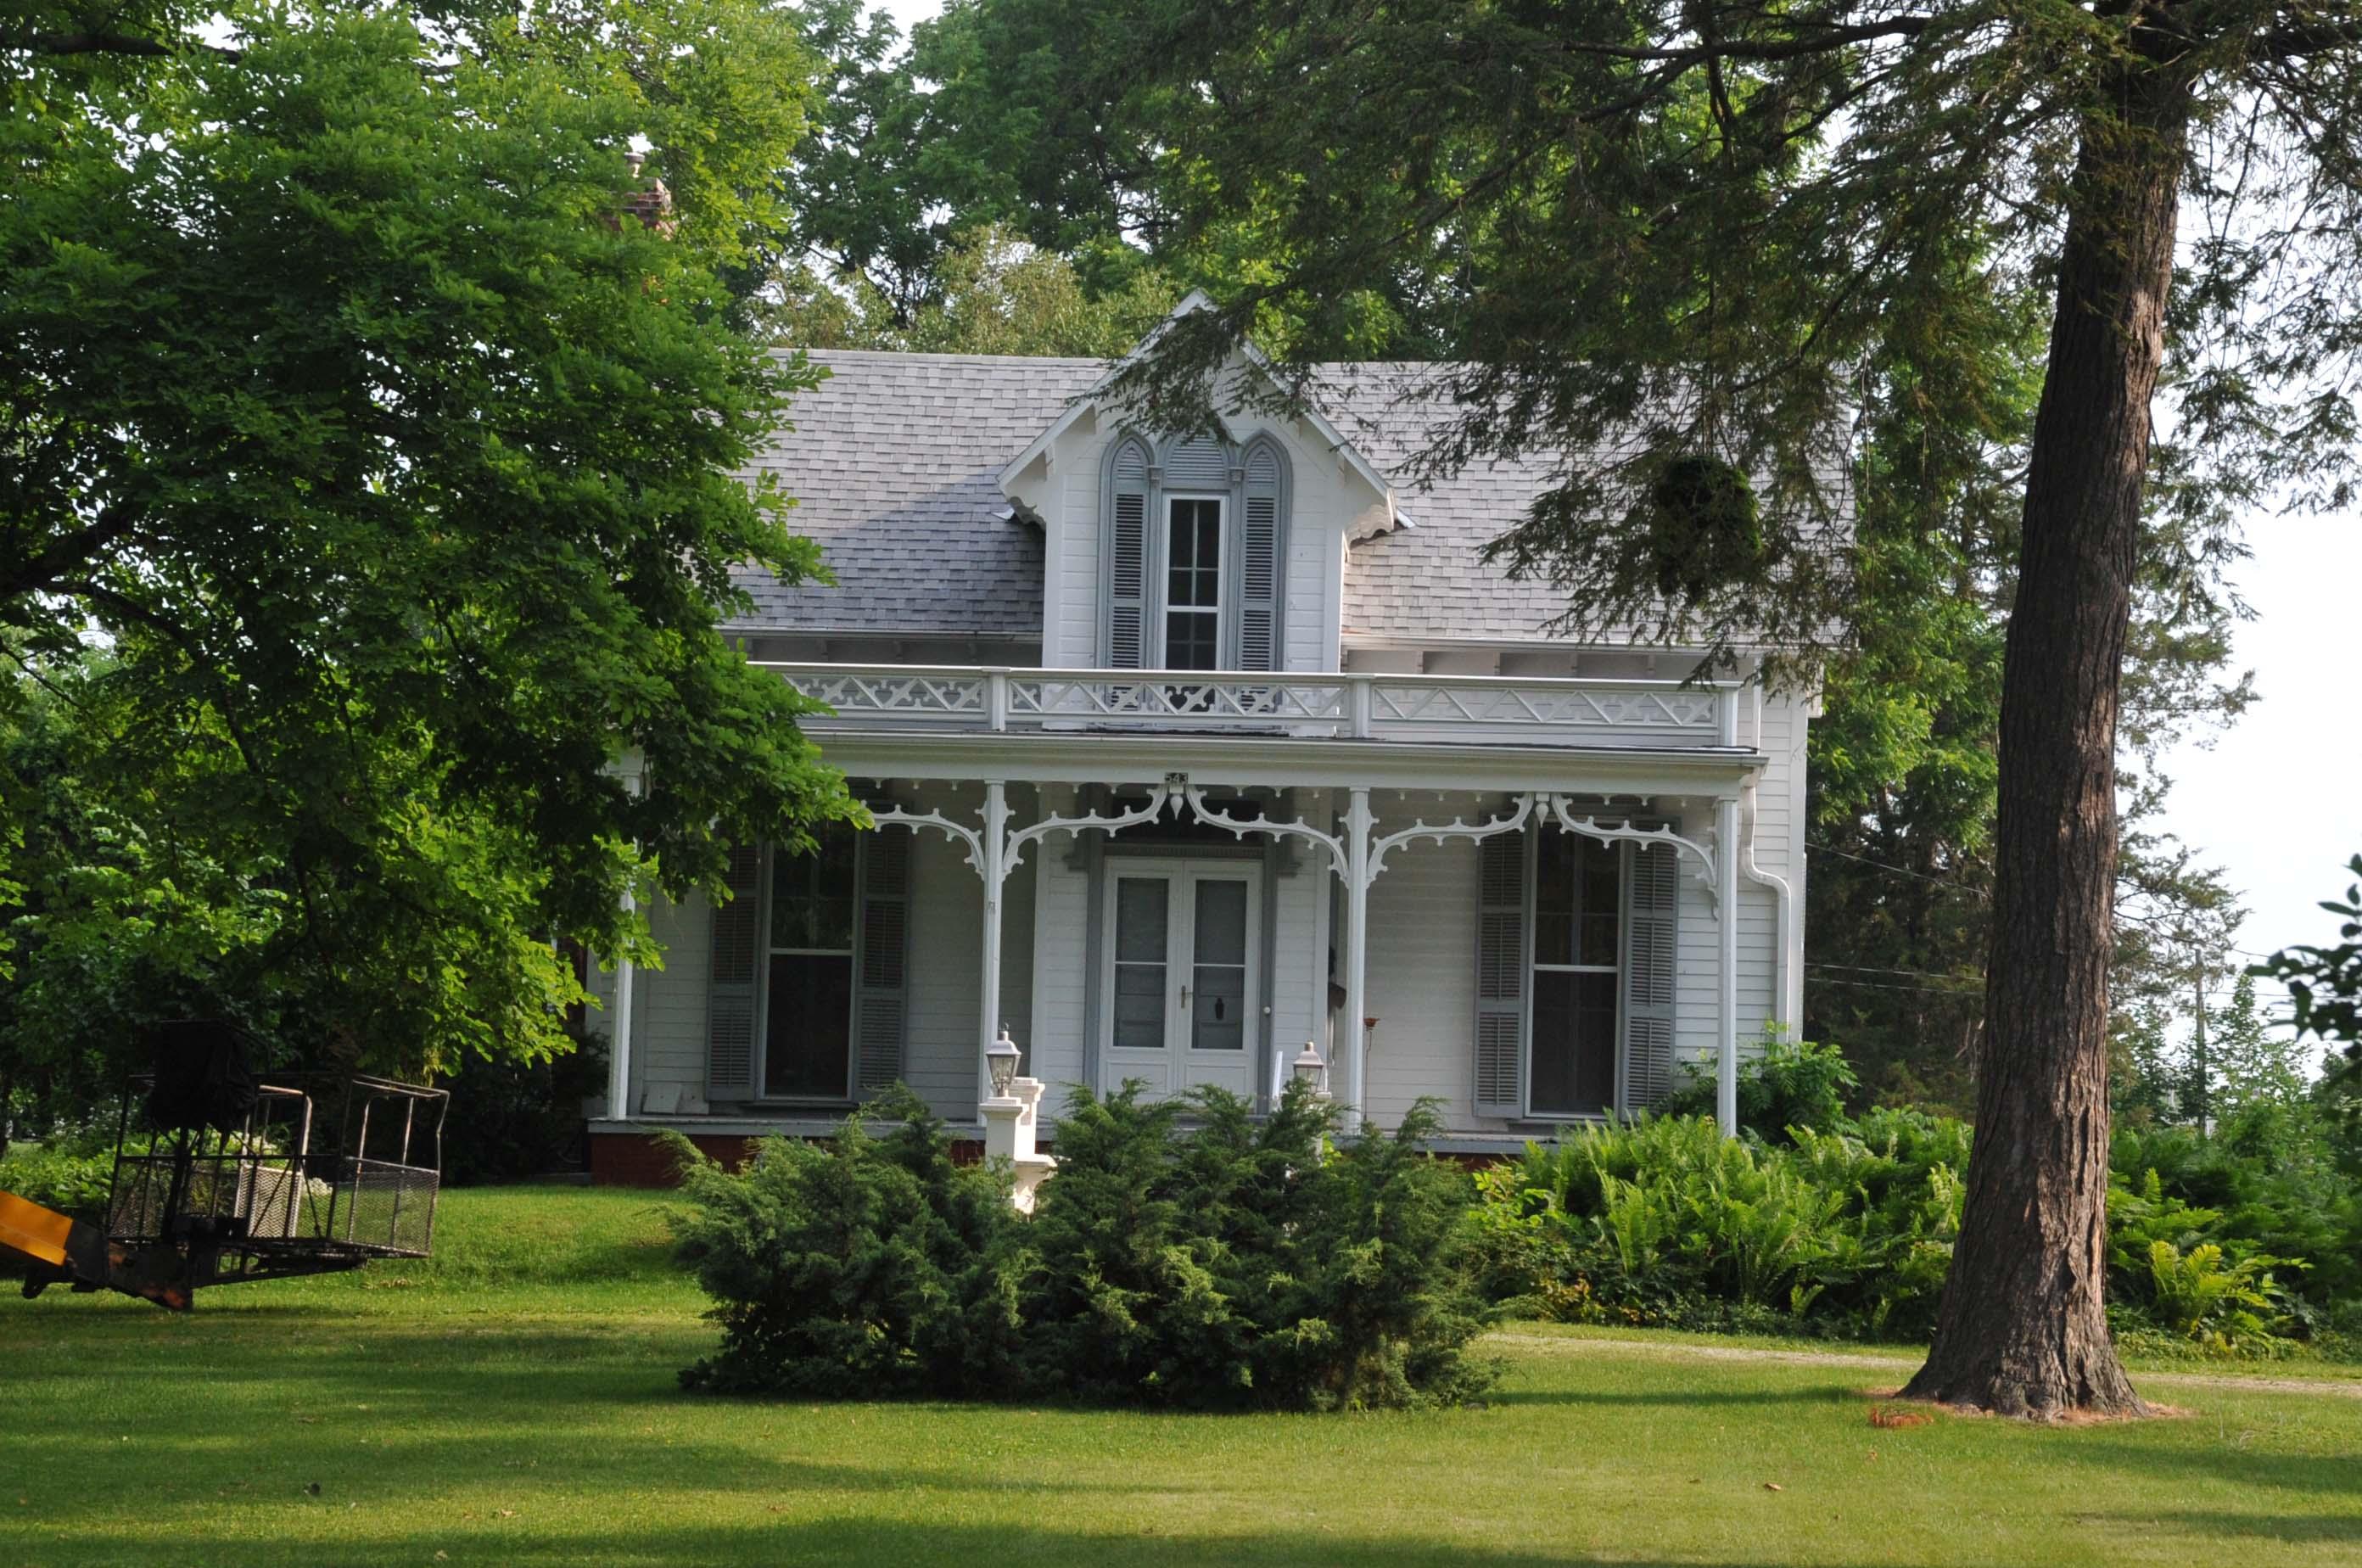 Illinois bureau county princeton - File Greenwood Cottage Princeton Bureau County Illinois Jpg